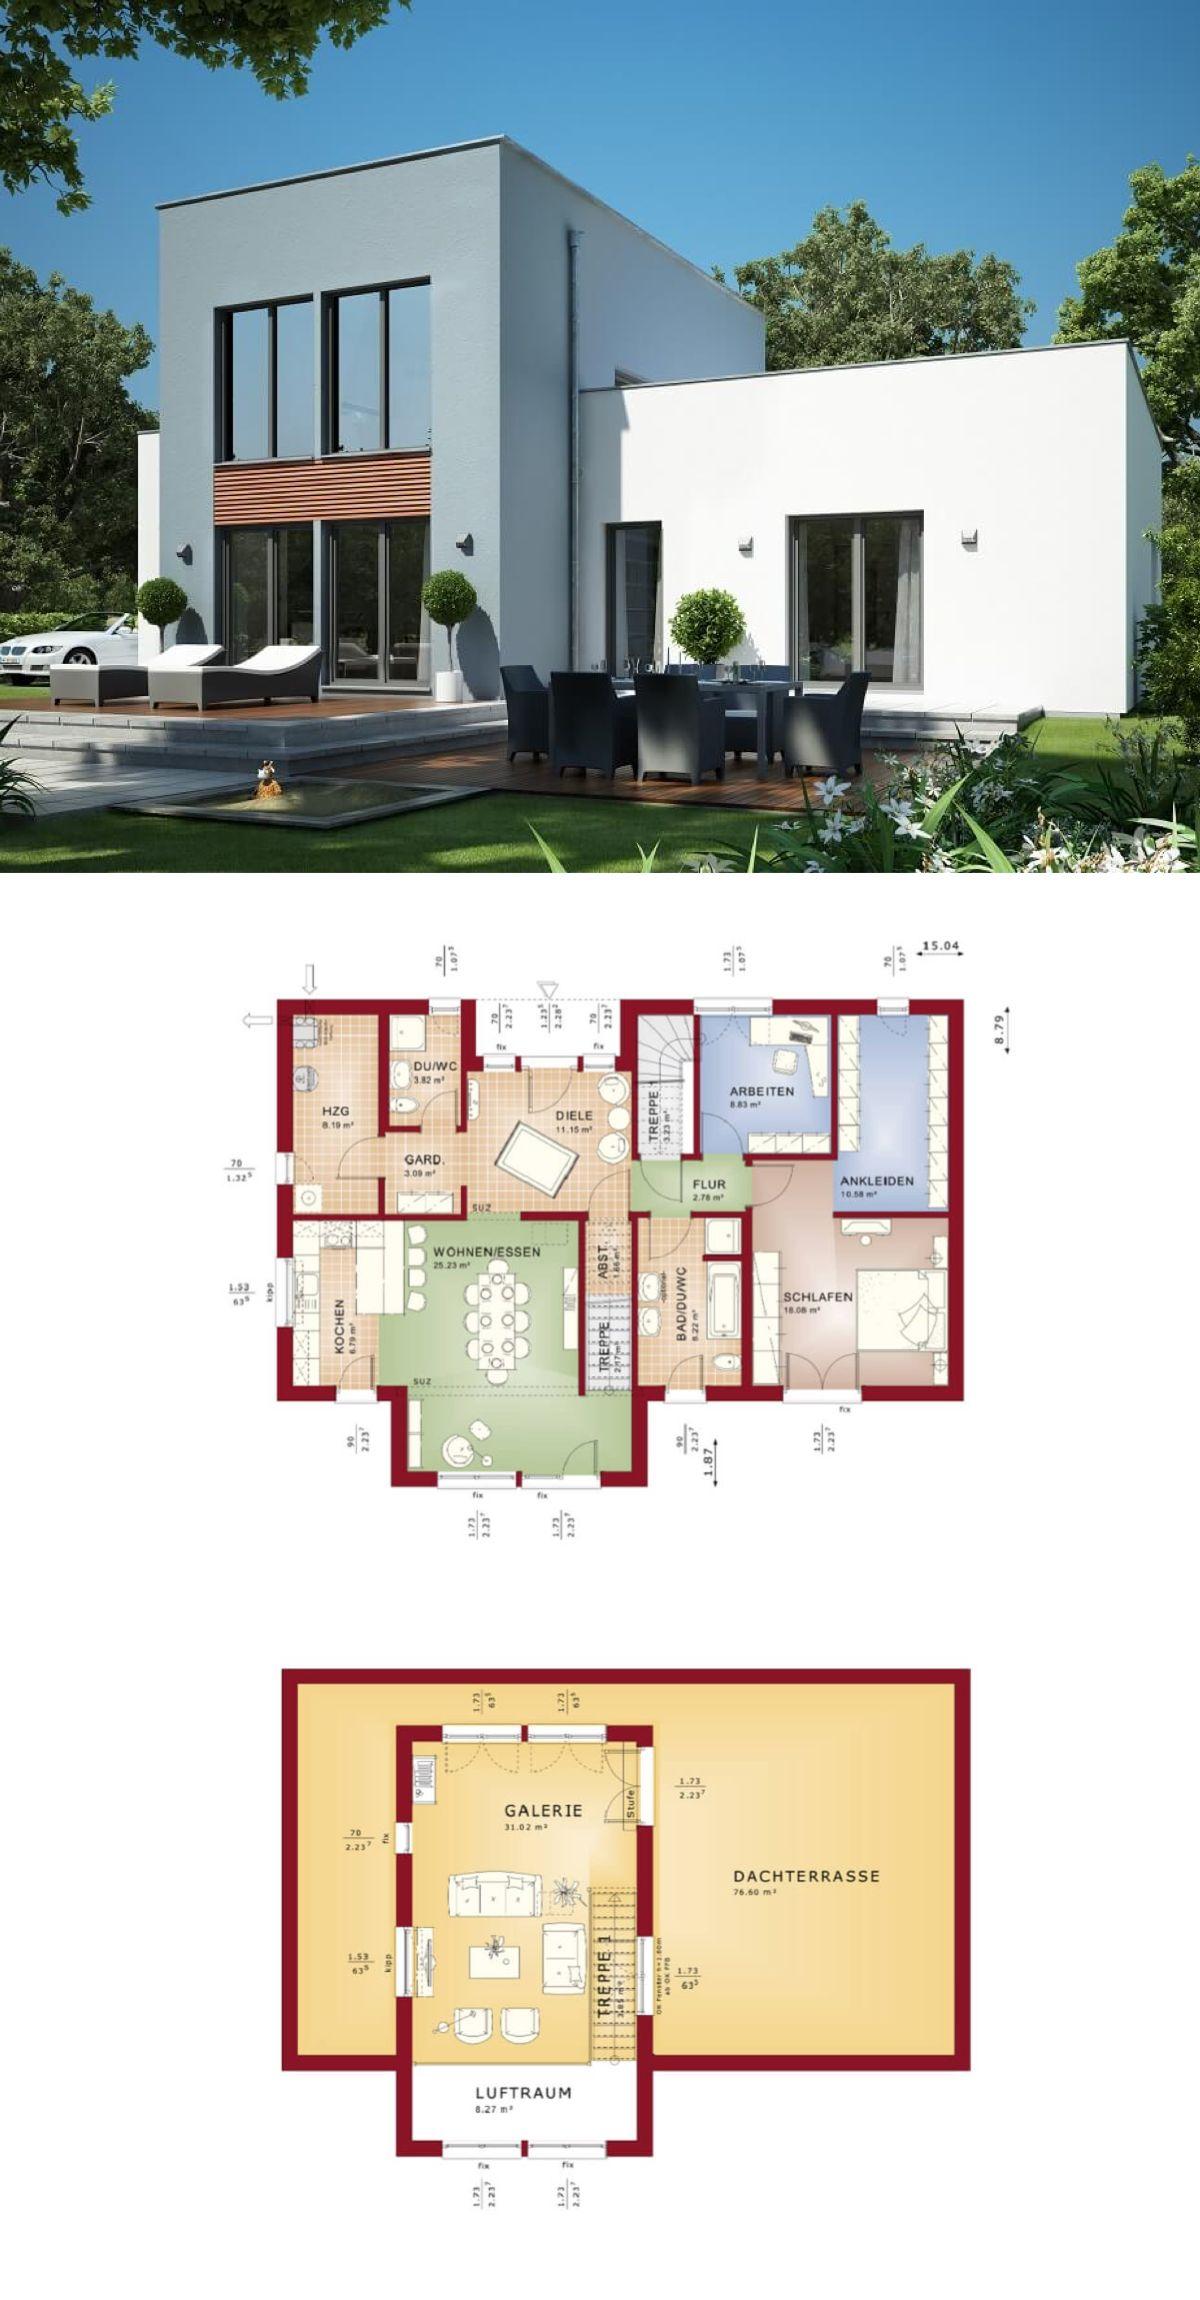 Haus bauen modern flachdach for Haus bauen bauhausstil